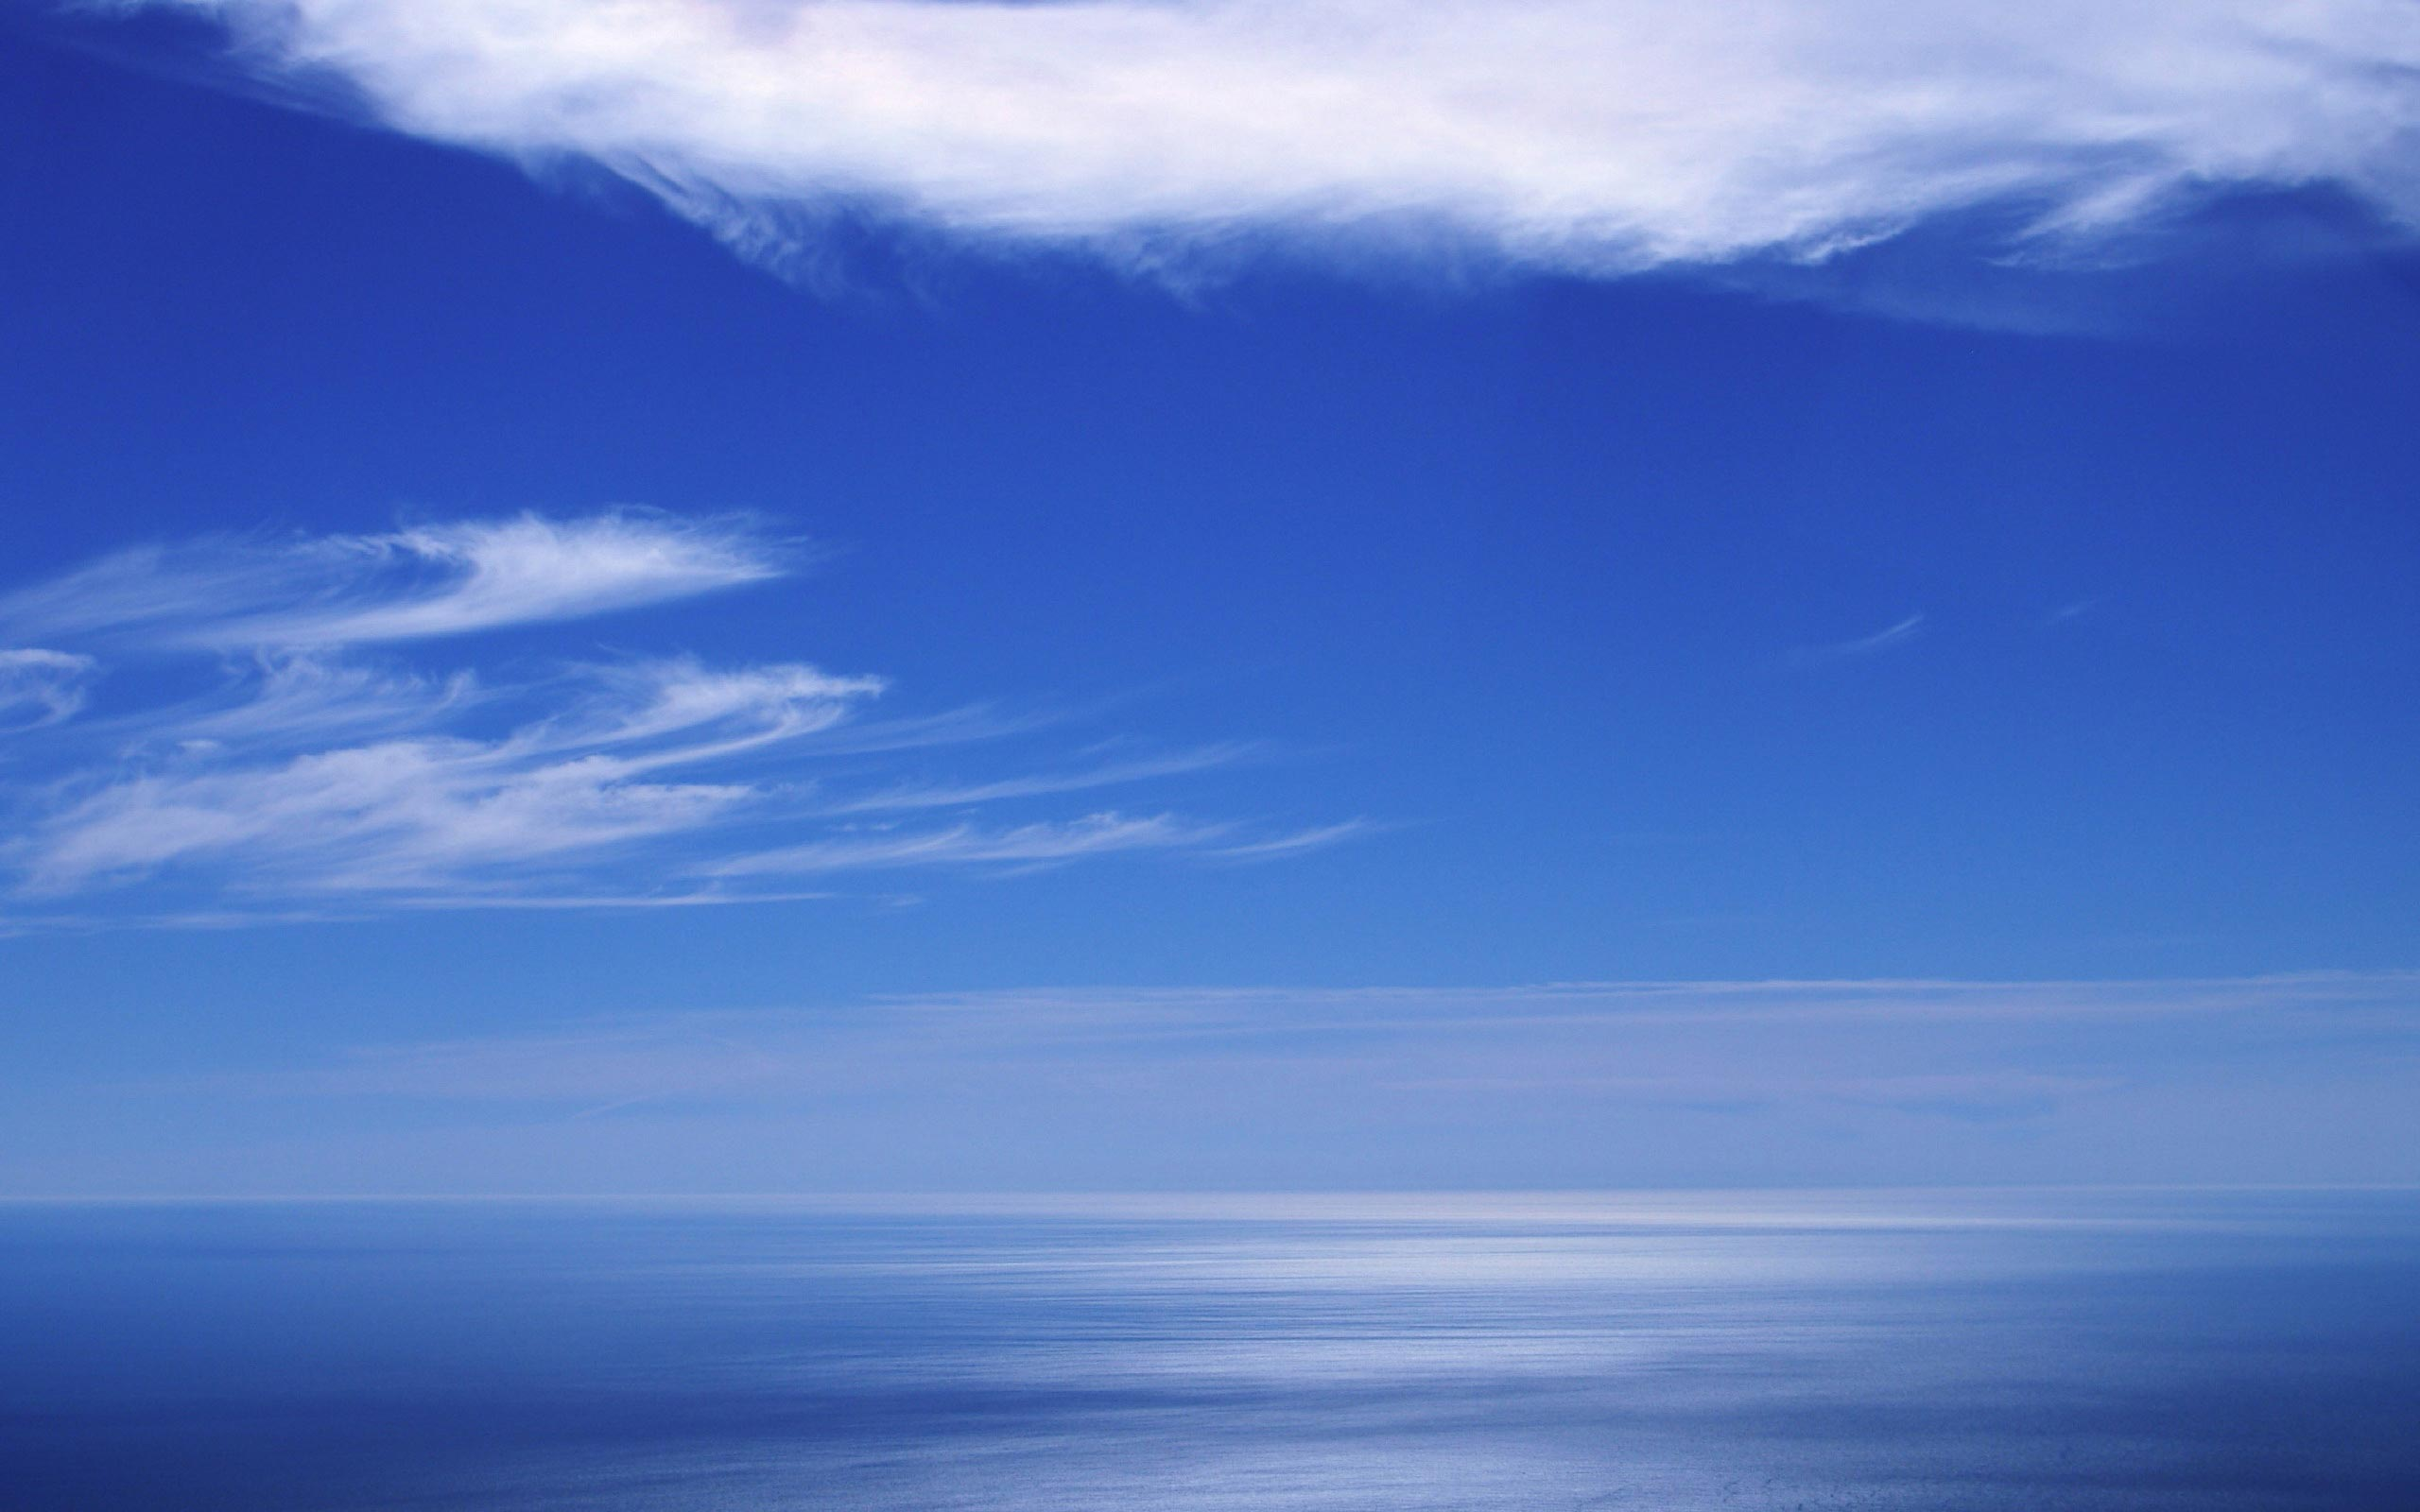 HD Wallpapers Blue Sky